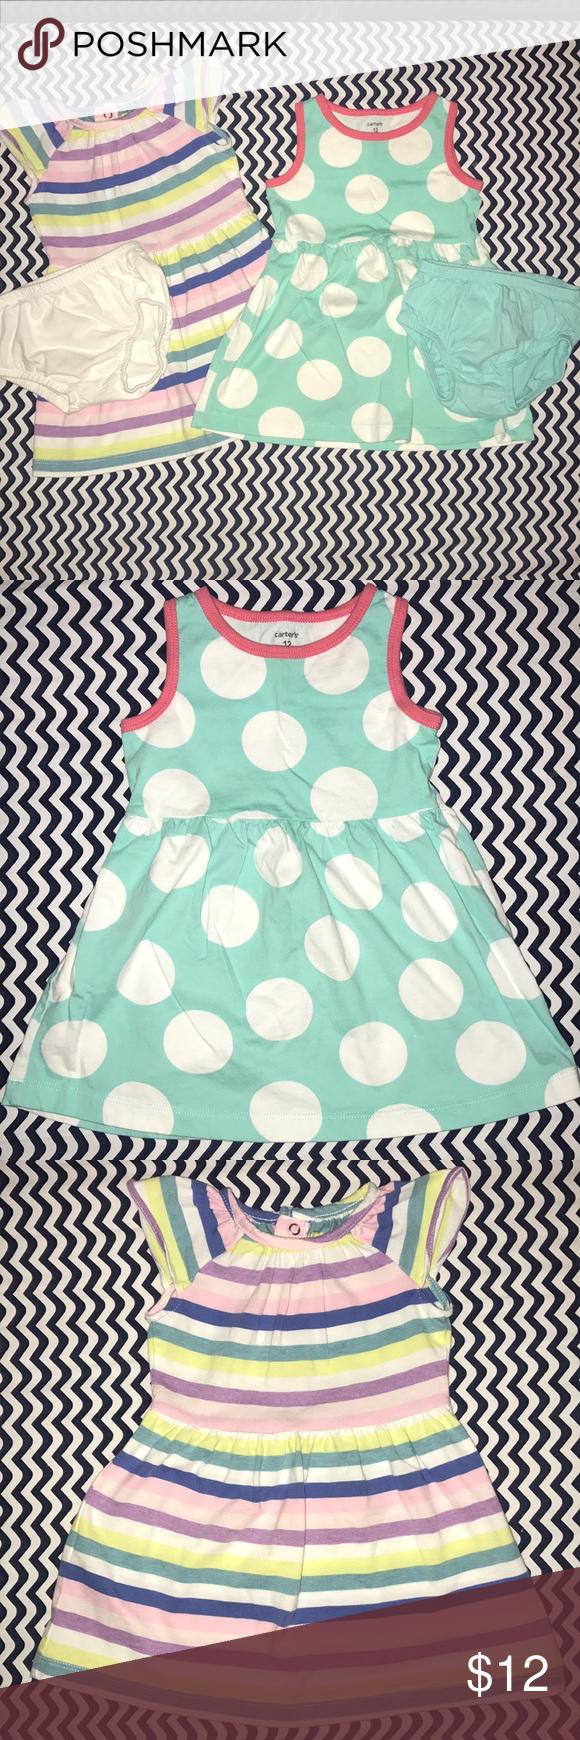 Green dress baby images  Carterus summer dresses baby girl  mon  My Posh Picks